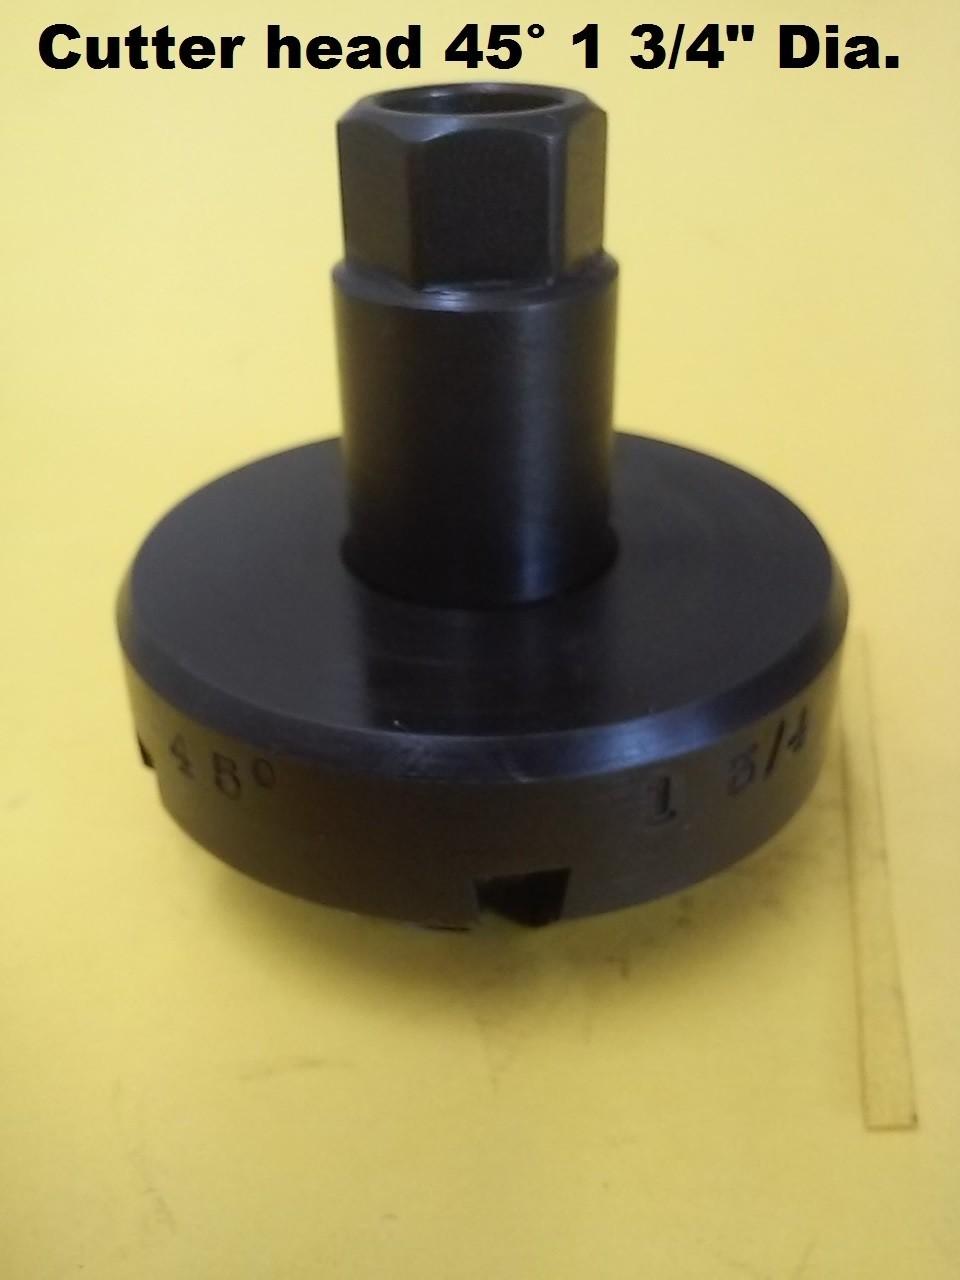 "Cutter Head 1 3/4"" Diameter 45° angle"